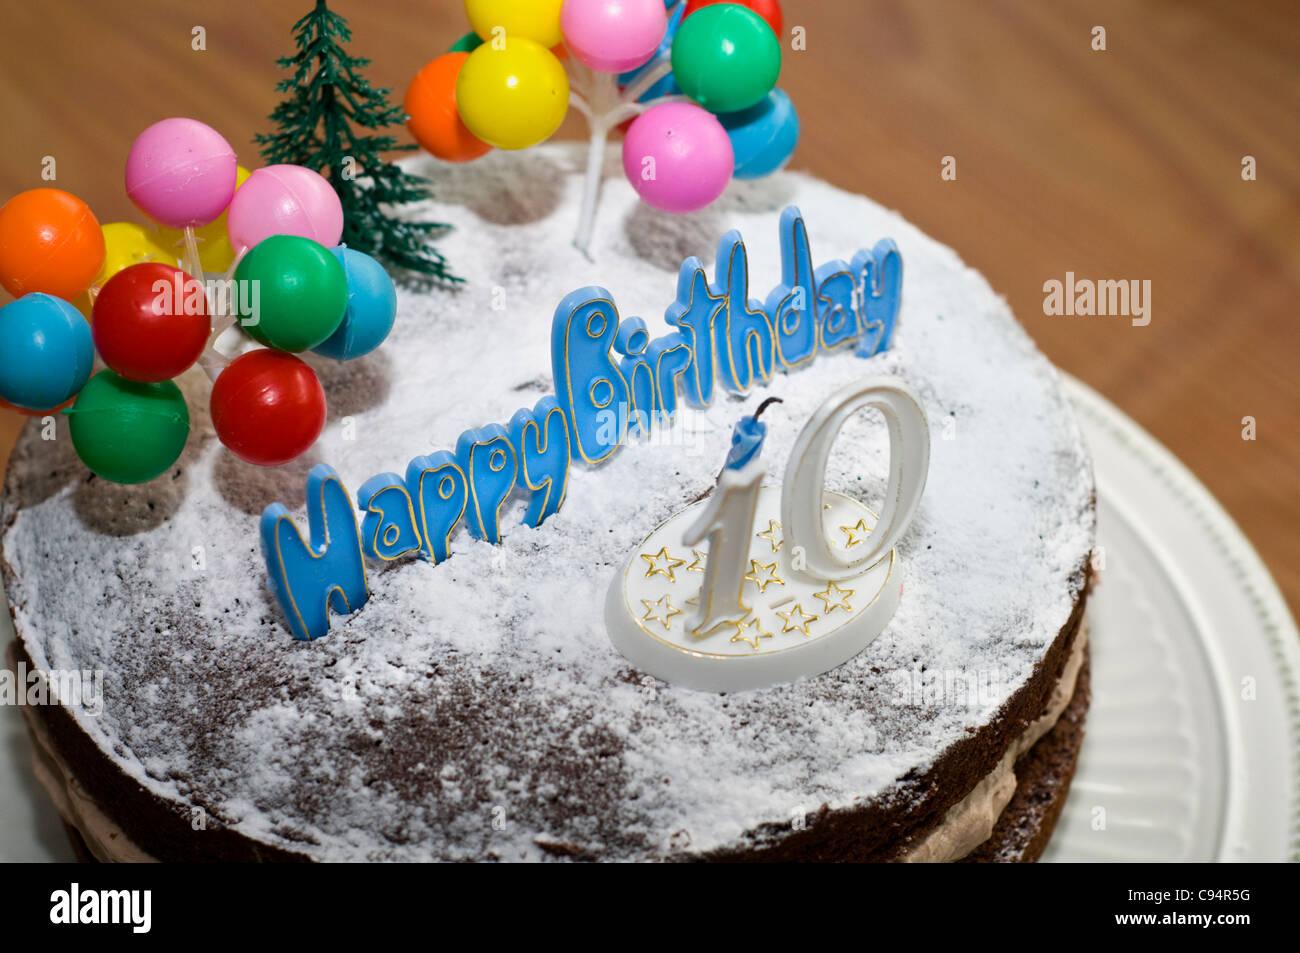 A birthday cake celebrating someone's tenth birthday - Stock Image